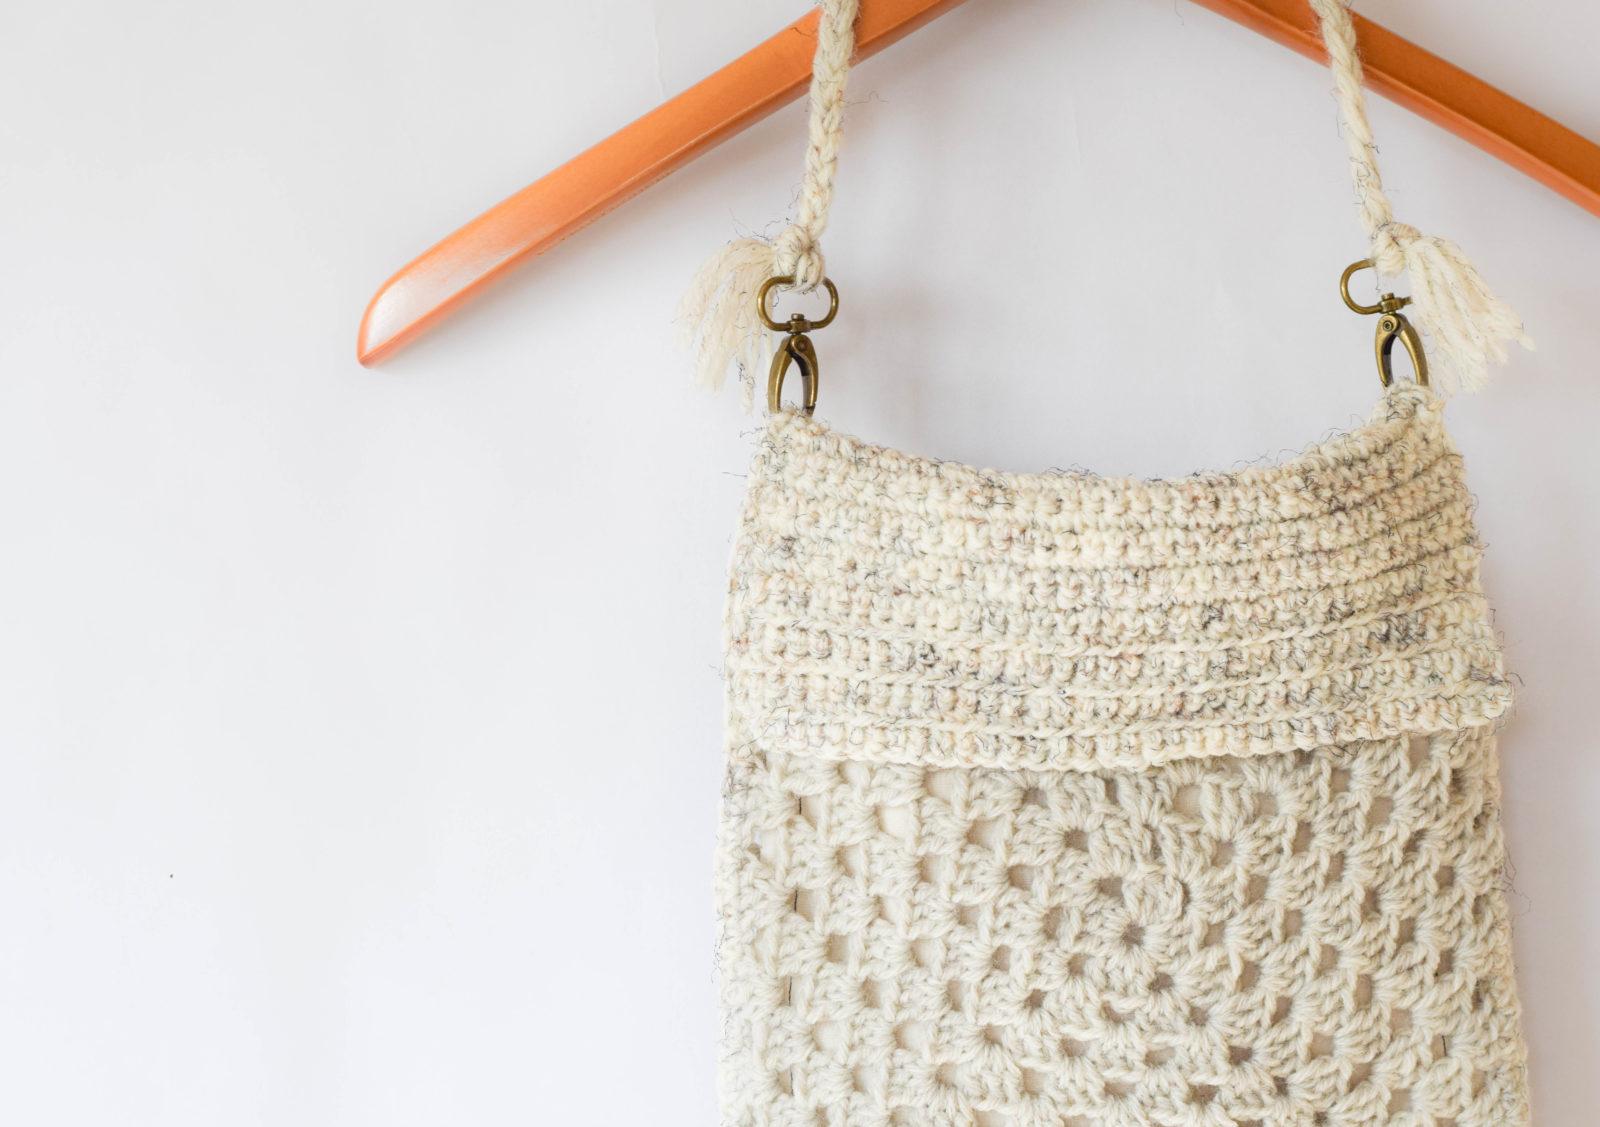 crochet purse boho granny square crochet bag pattern 3 lrcdgyd